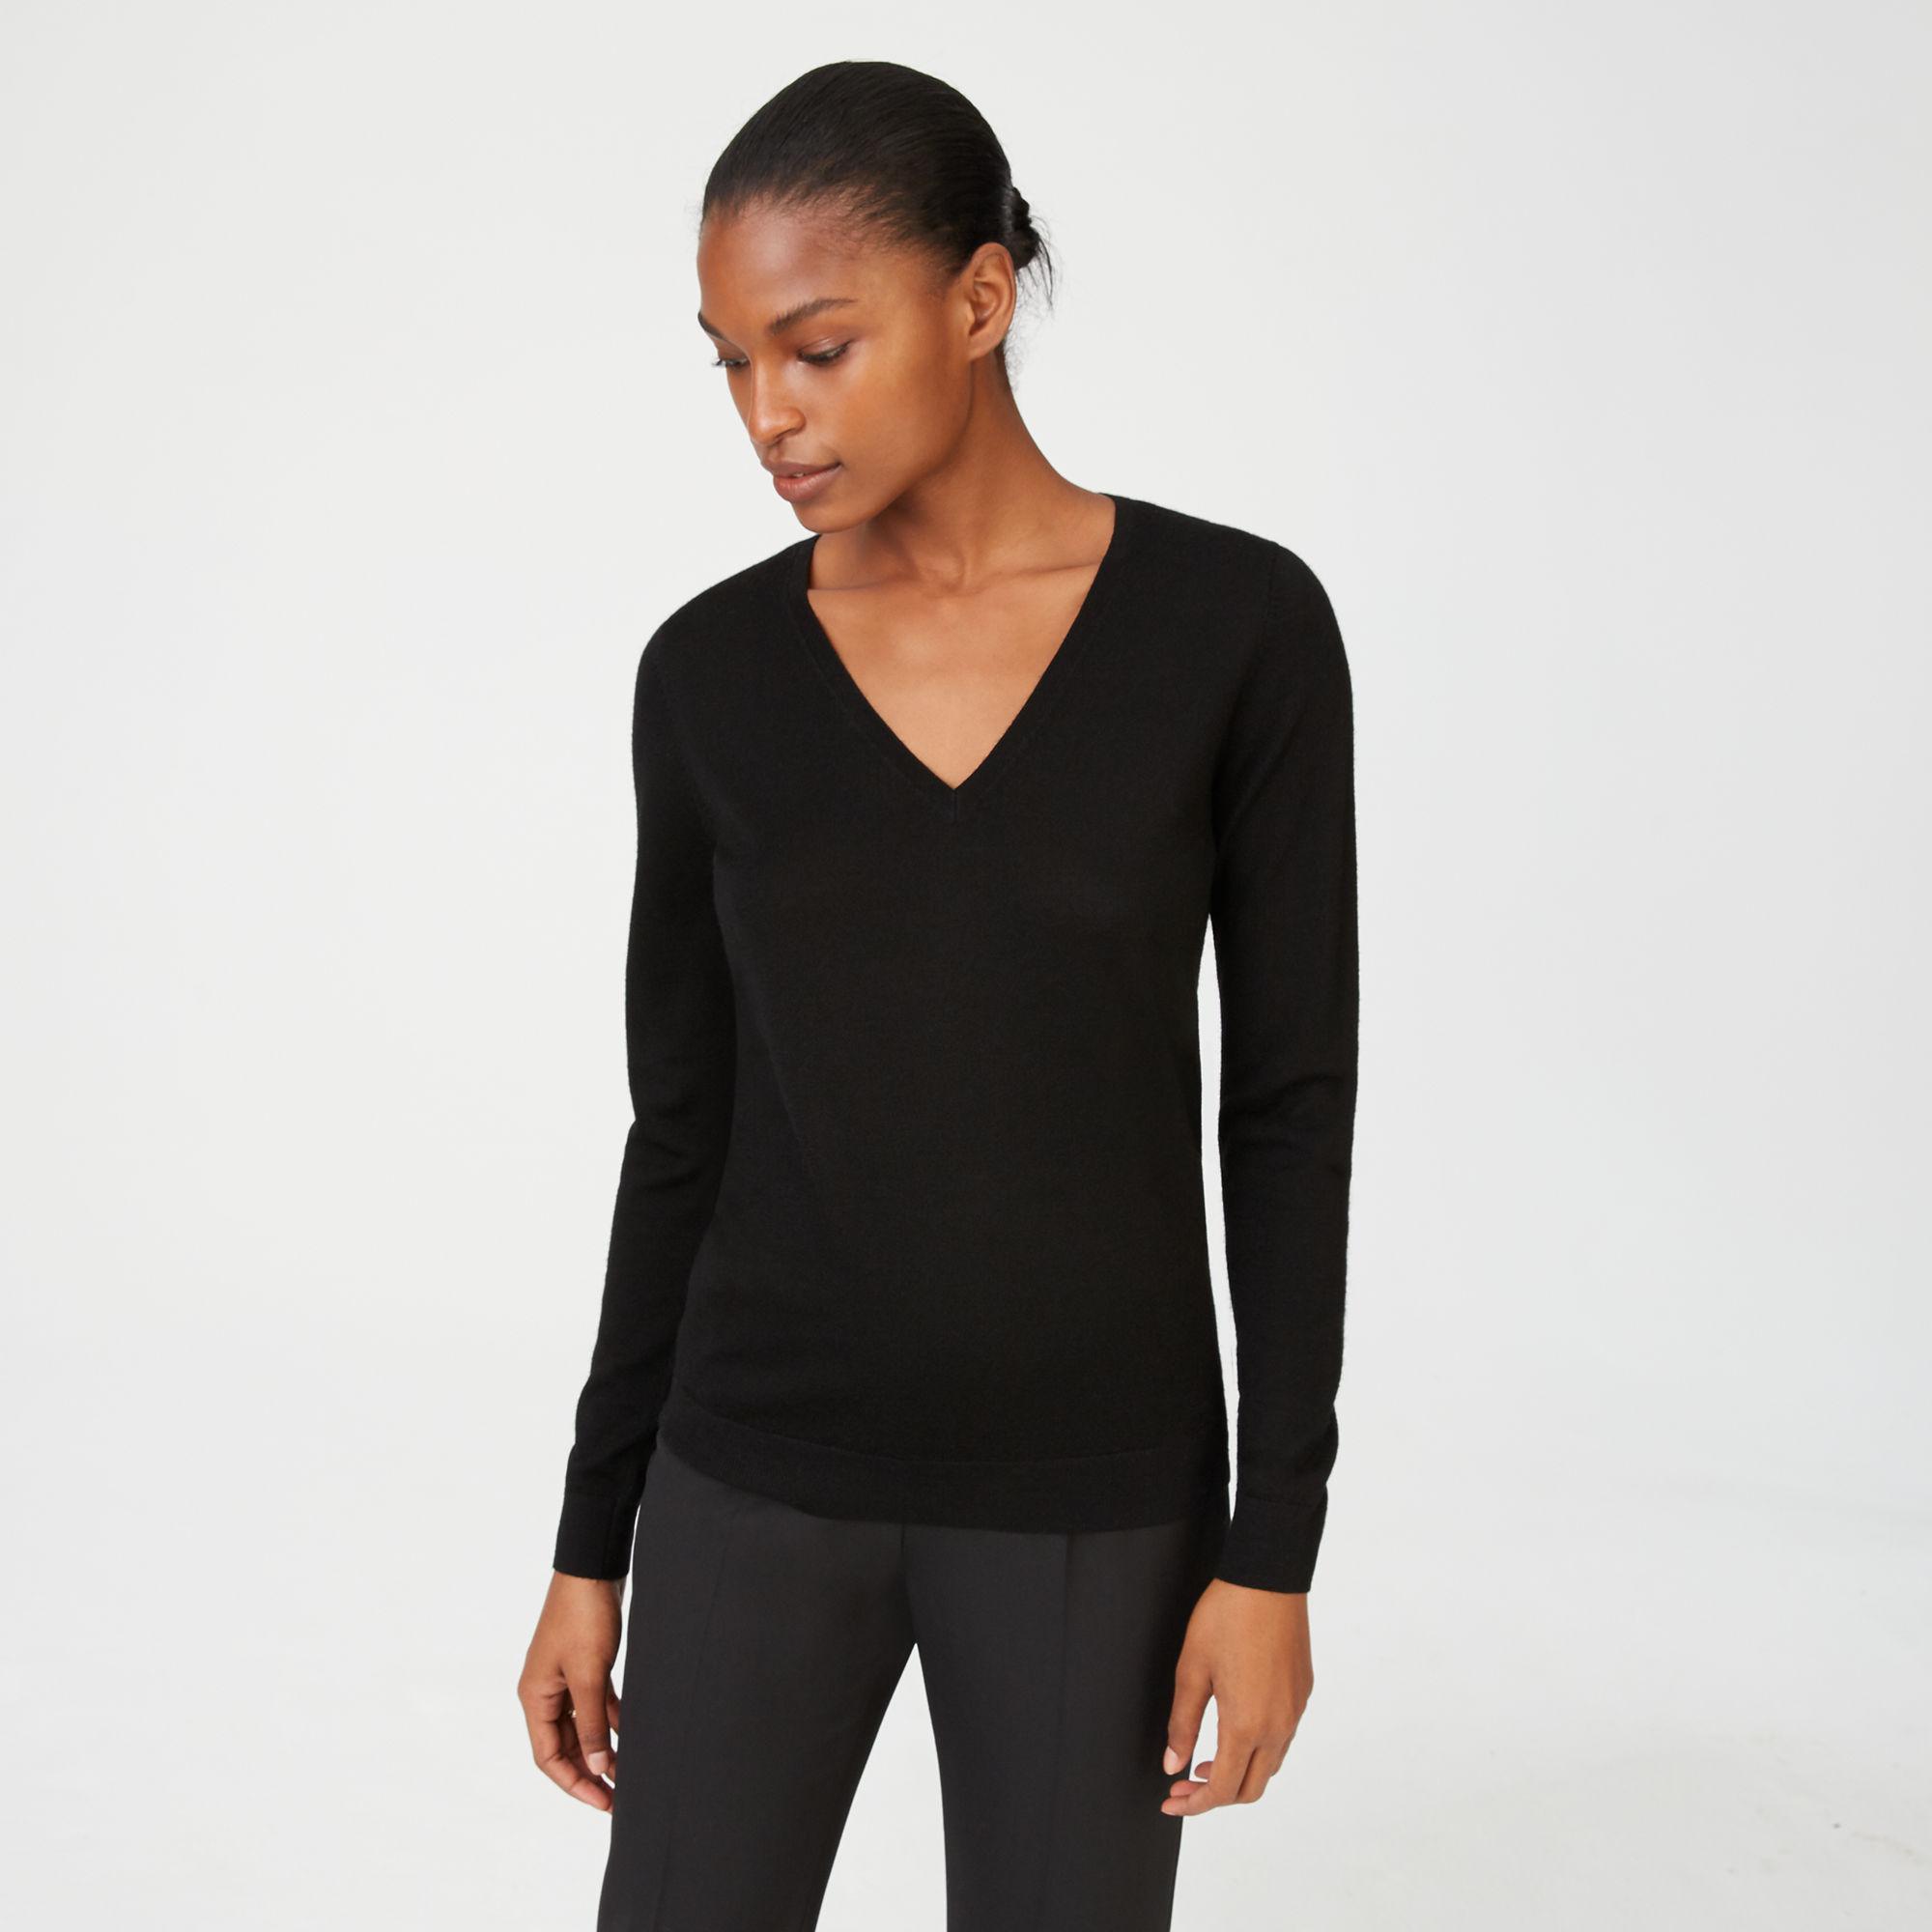 89b2efc7193e5 Lyst - Club Monaco Agnes Merino Wool Sweater in Black